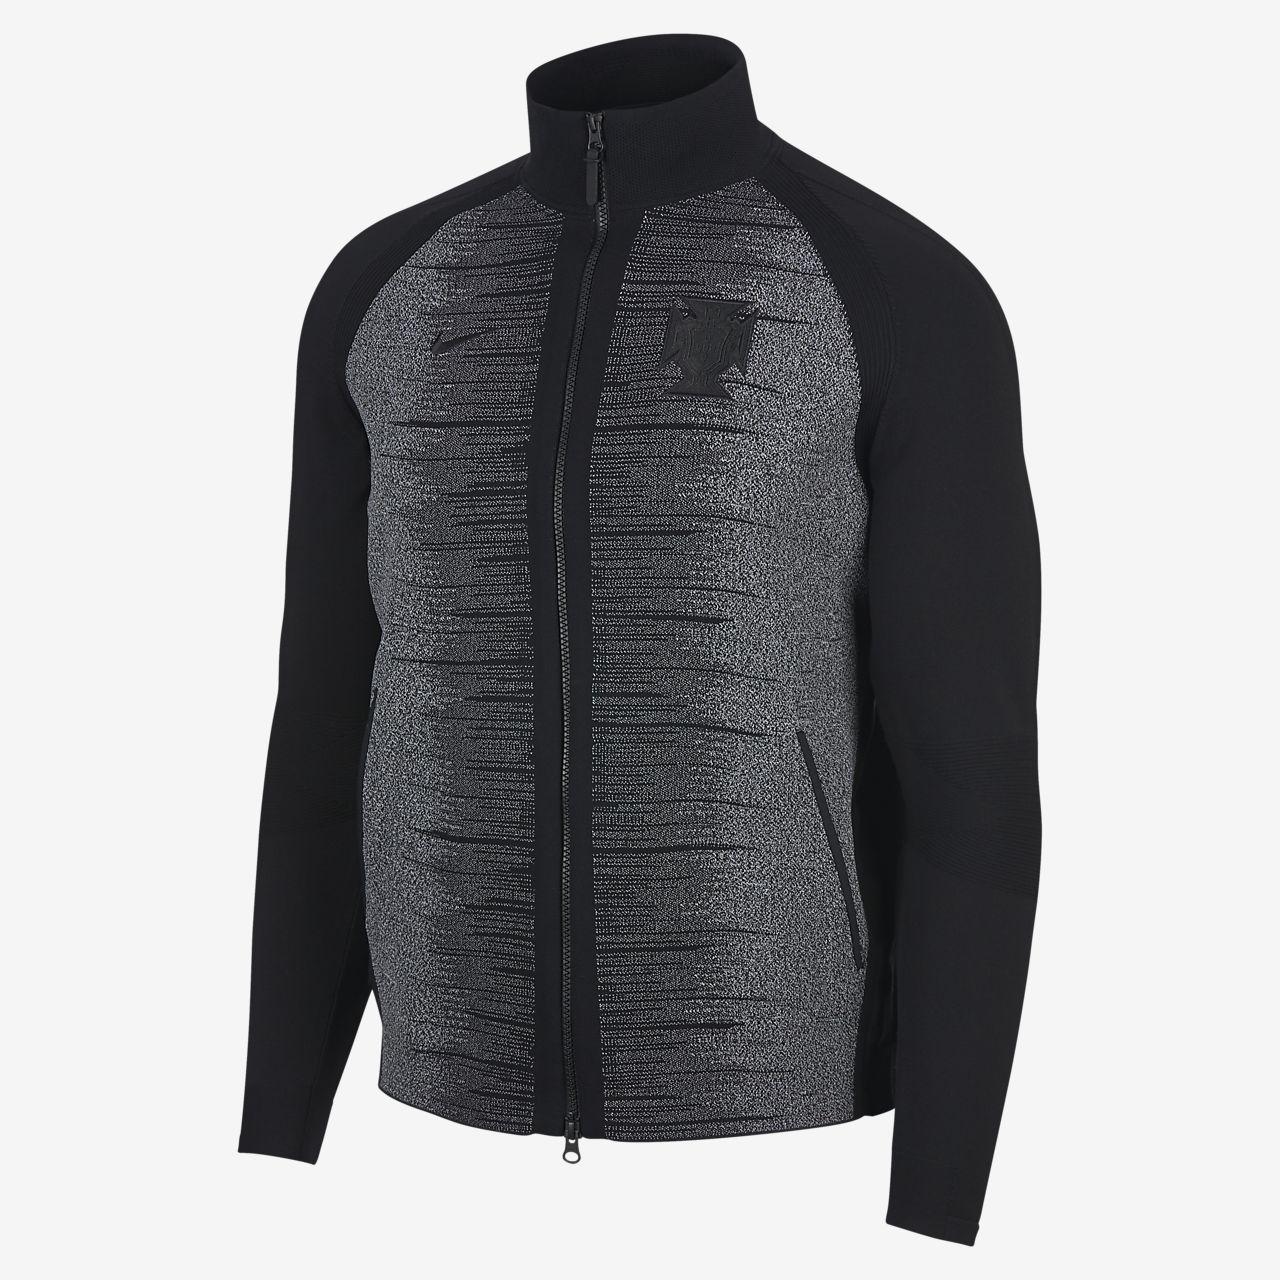 54b9a823 Portugal Tech Knit Men's Jacket. Nike.com GB